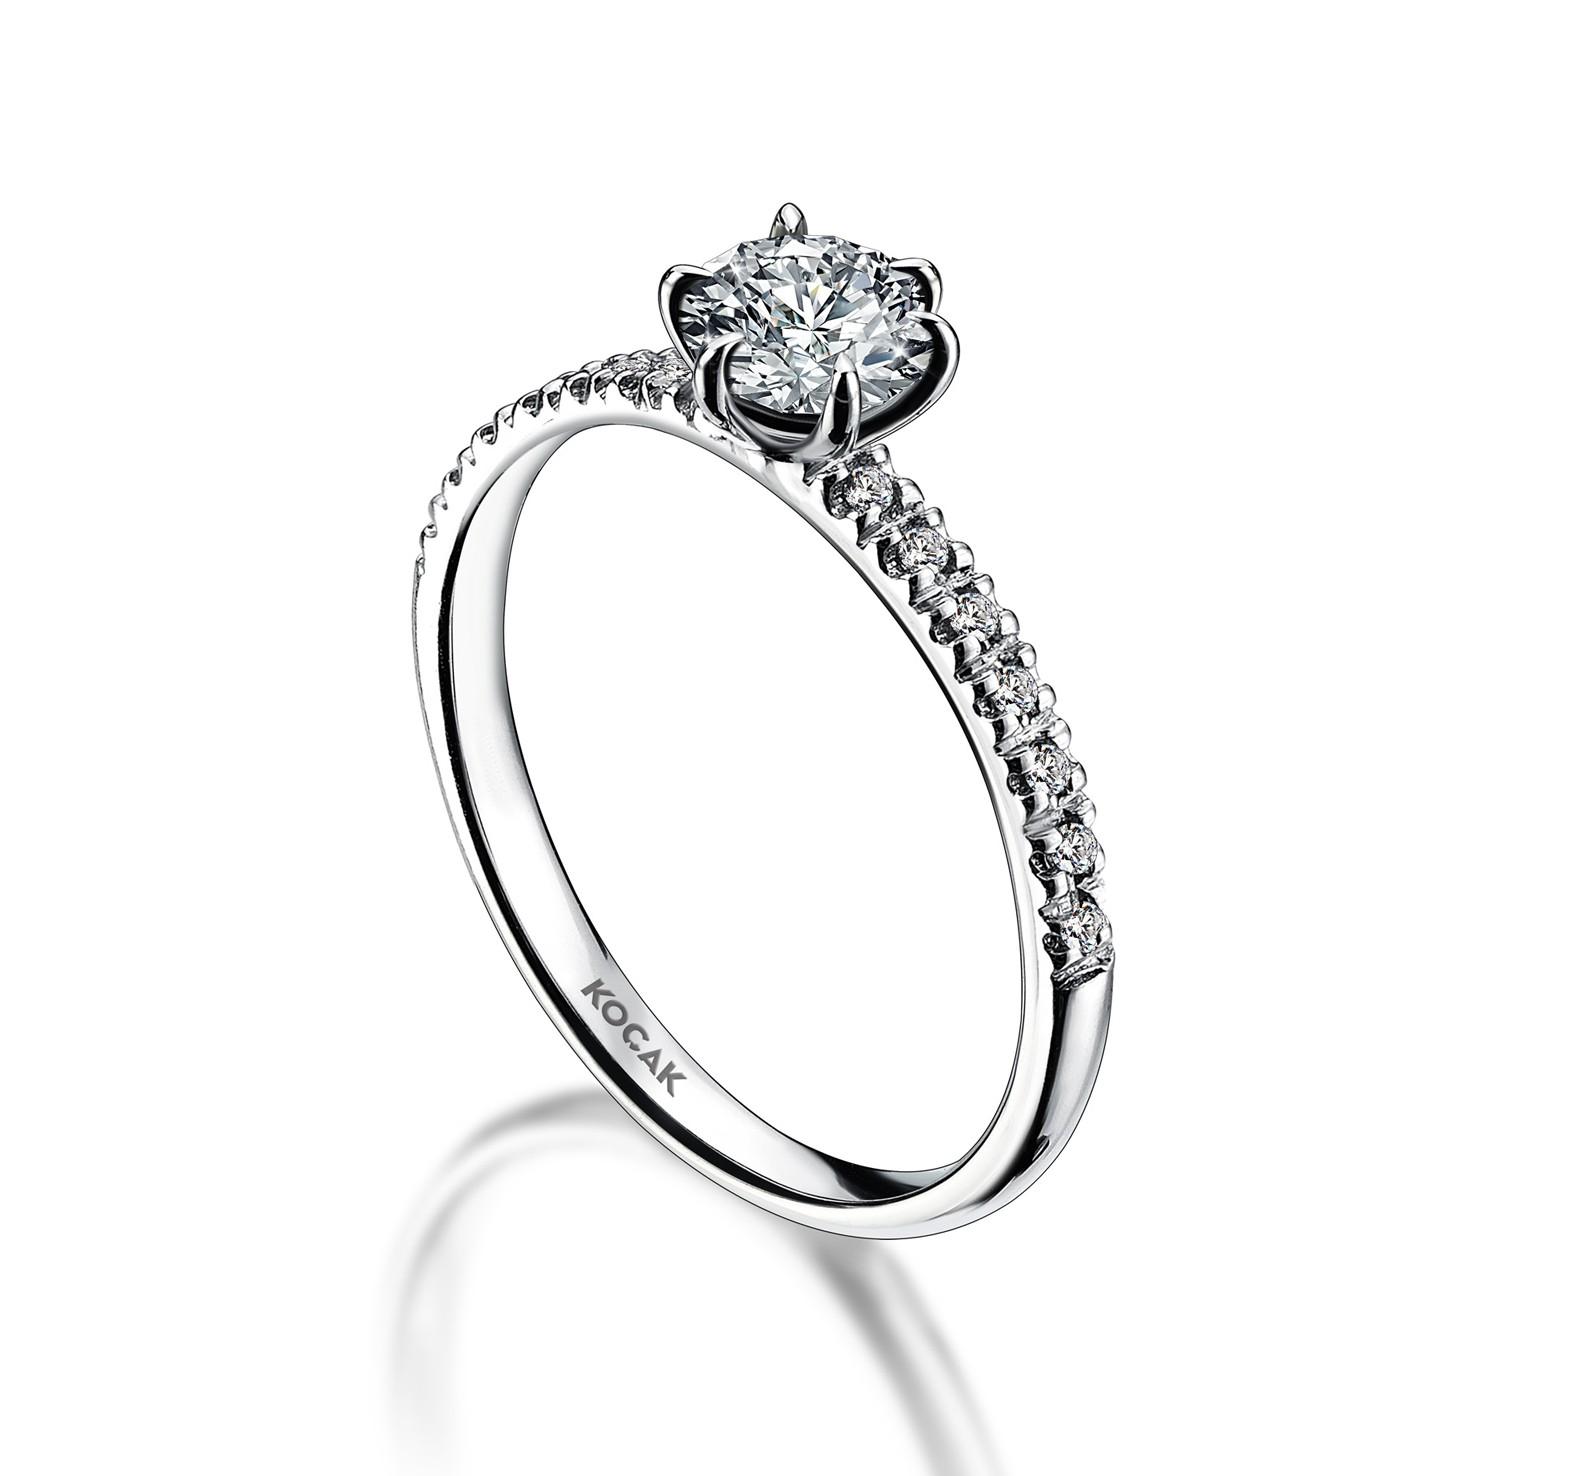 750 Kocak Gold | 0.35 ct Diamant Ring